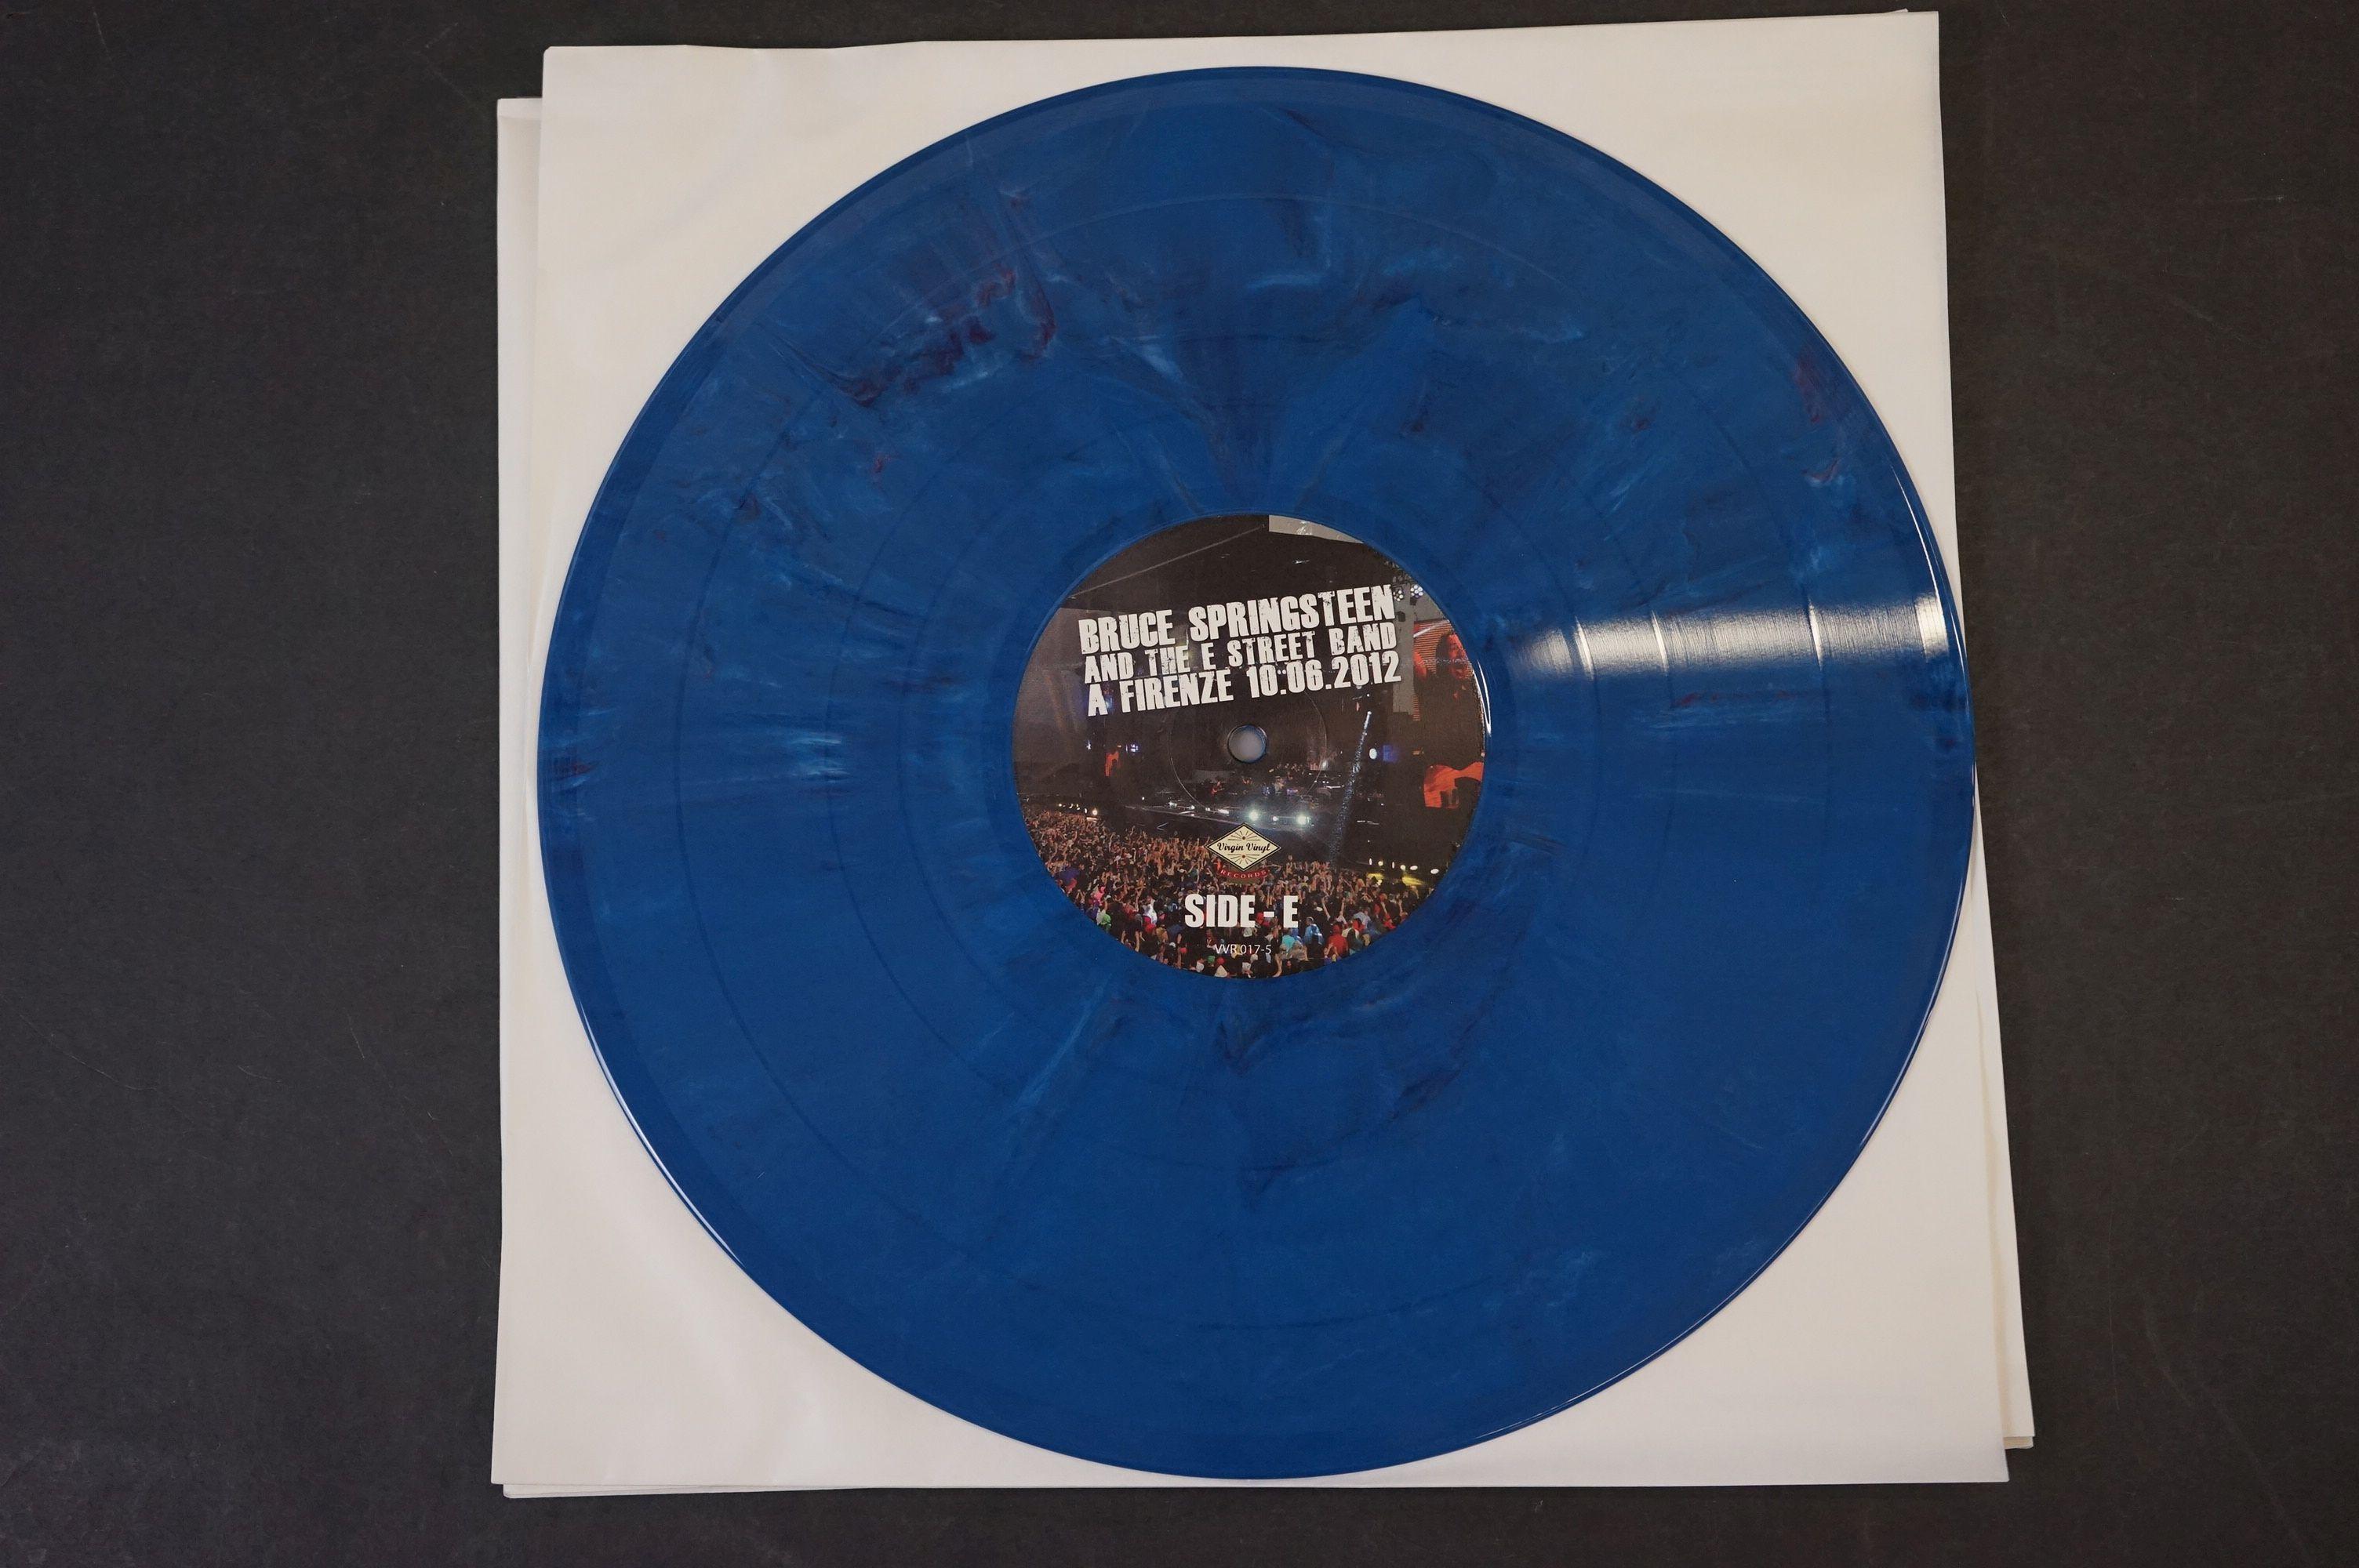 Vinyl - ltd edn Bruce Springsteen and The E Street Band A Firenze 10.06.2012 5 LP 3 CD 1 DVD heavy - Image 6 of 10